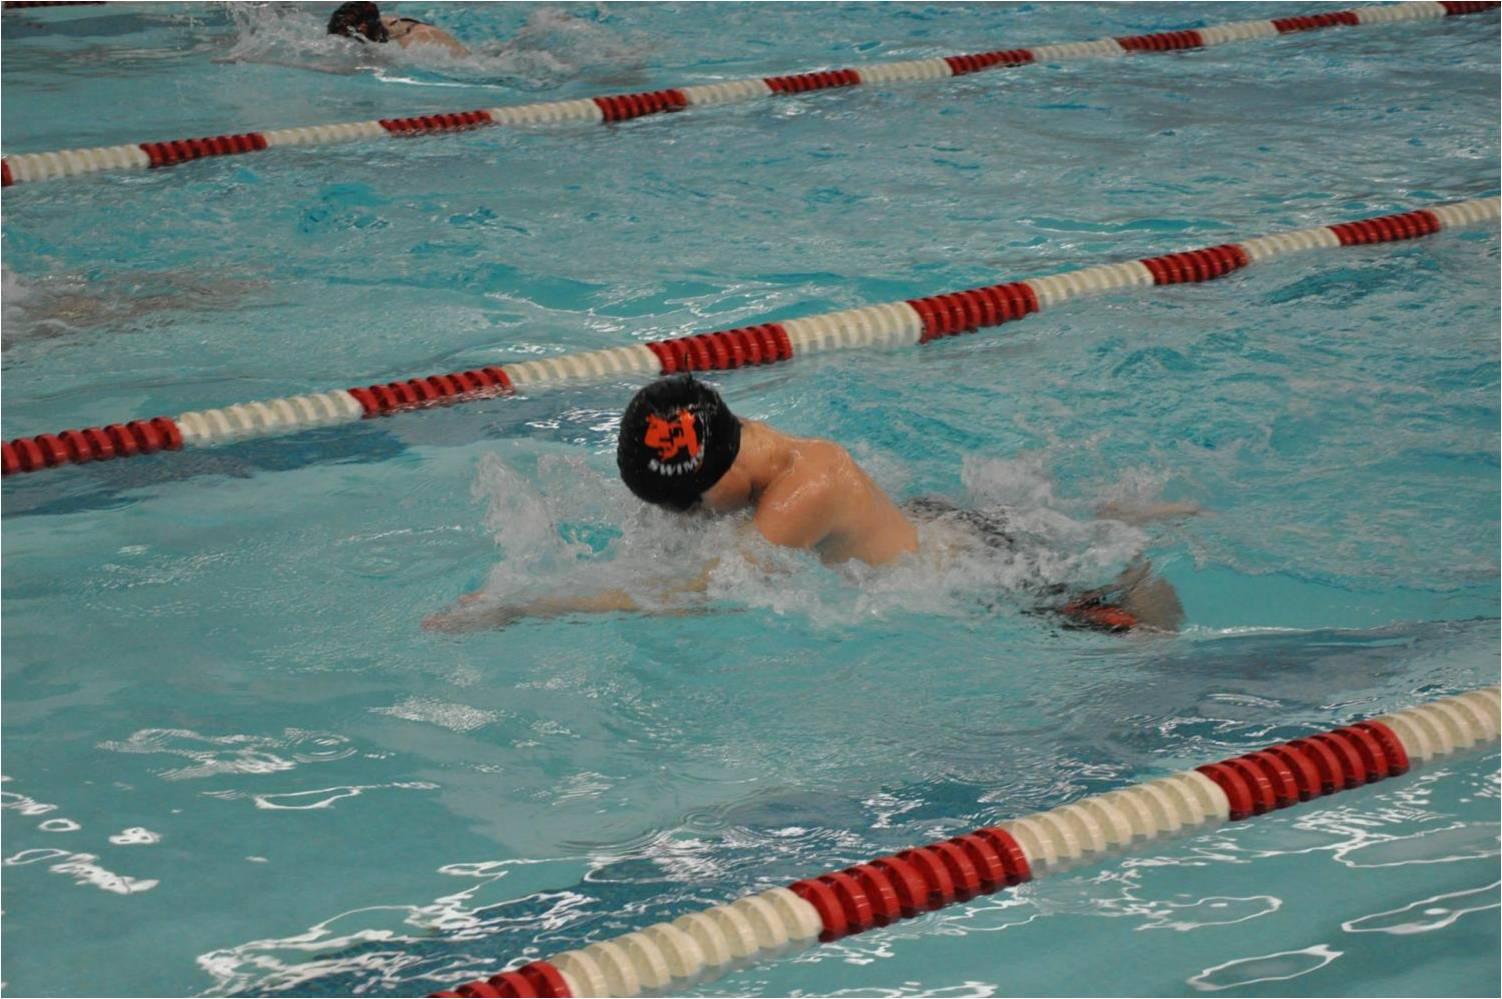 Jersey shore pa swim jersey shore ymca bloomsburg swim - Bloomsburg university swimming pool ...